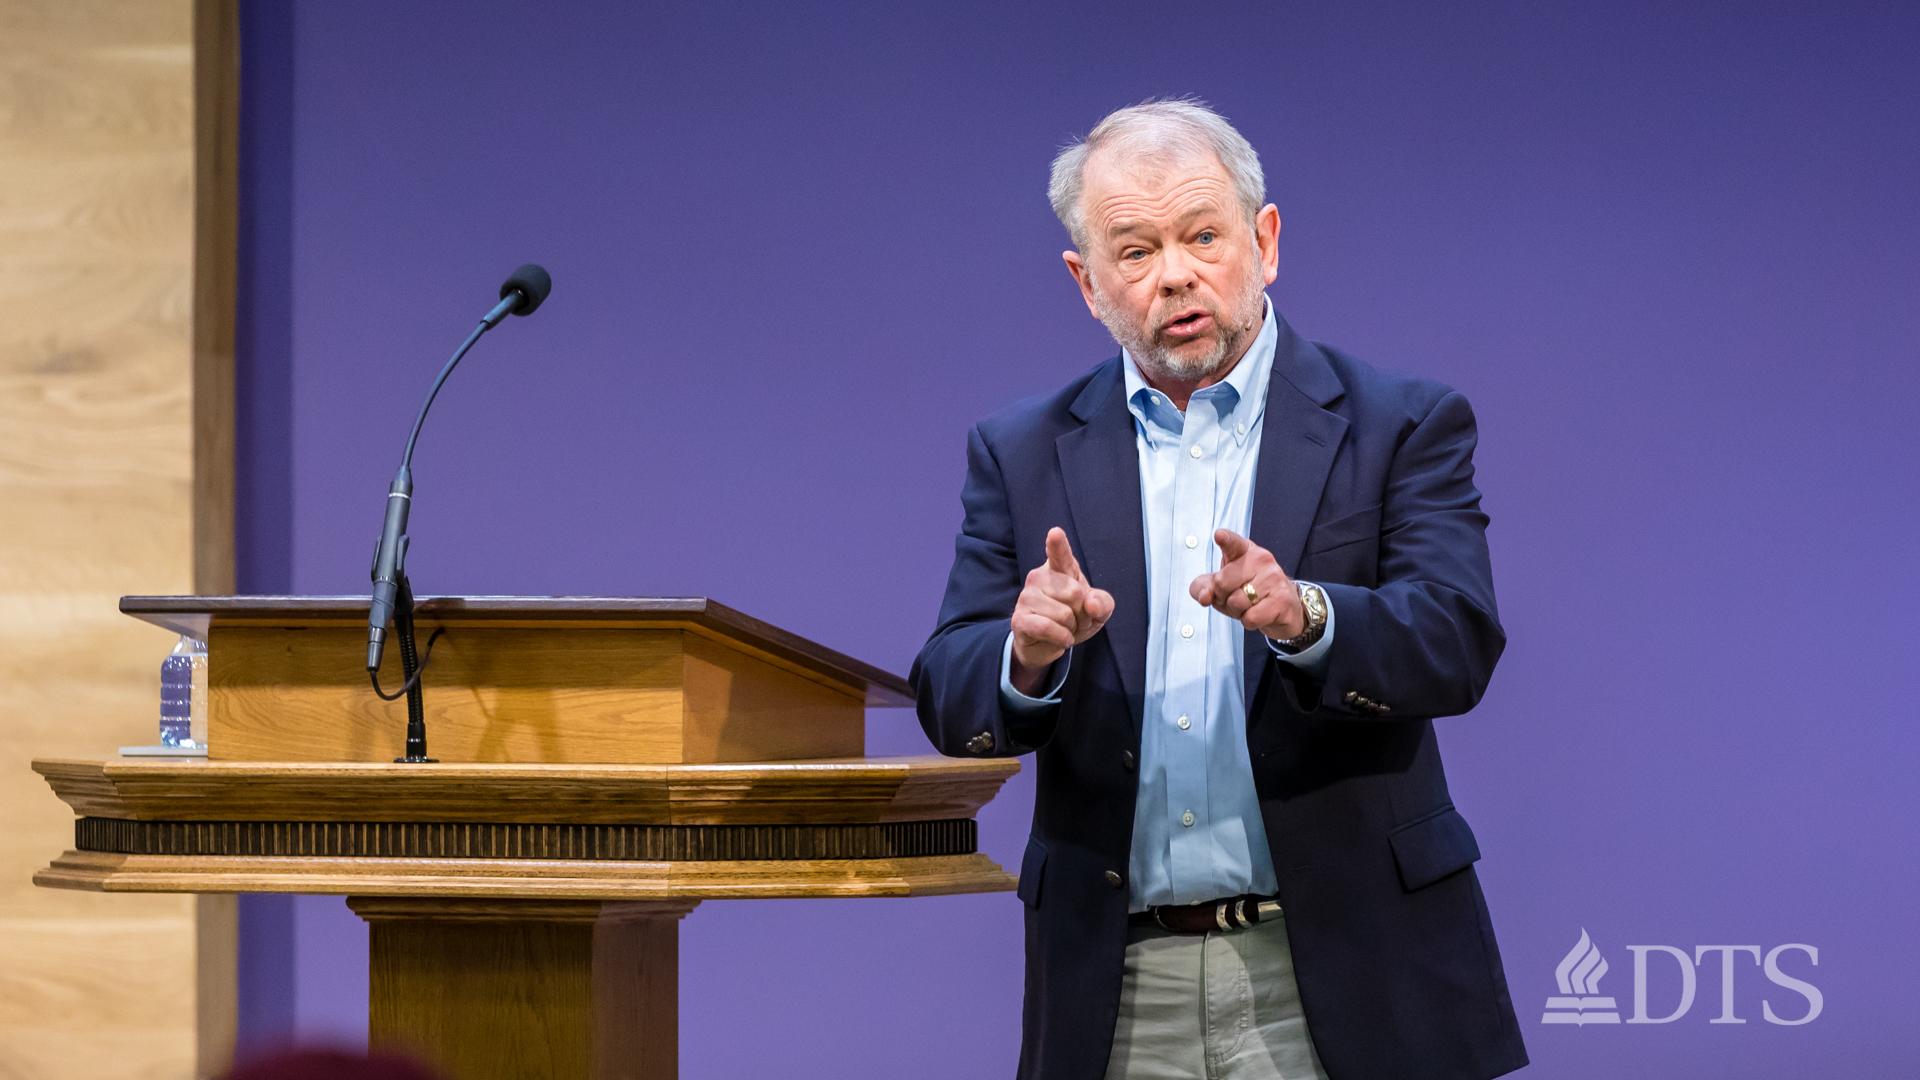 man standing near podium speaking at DTS Chapel